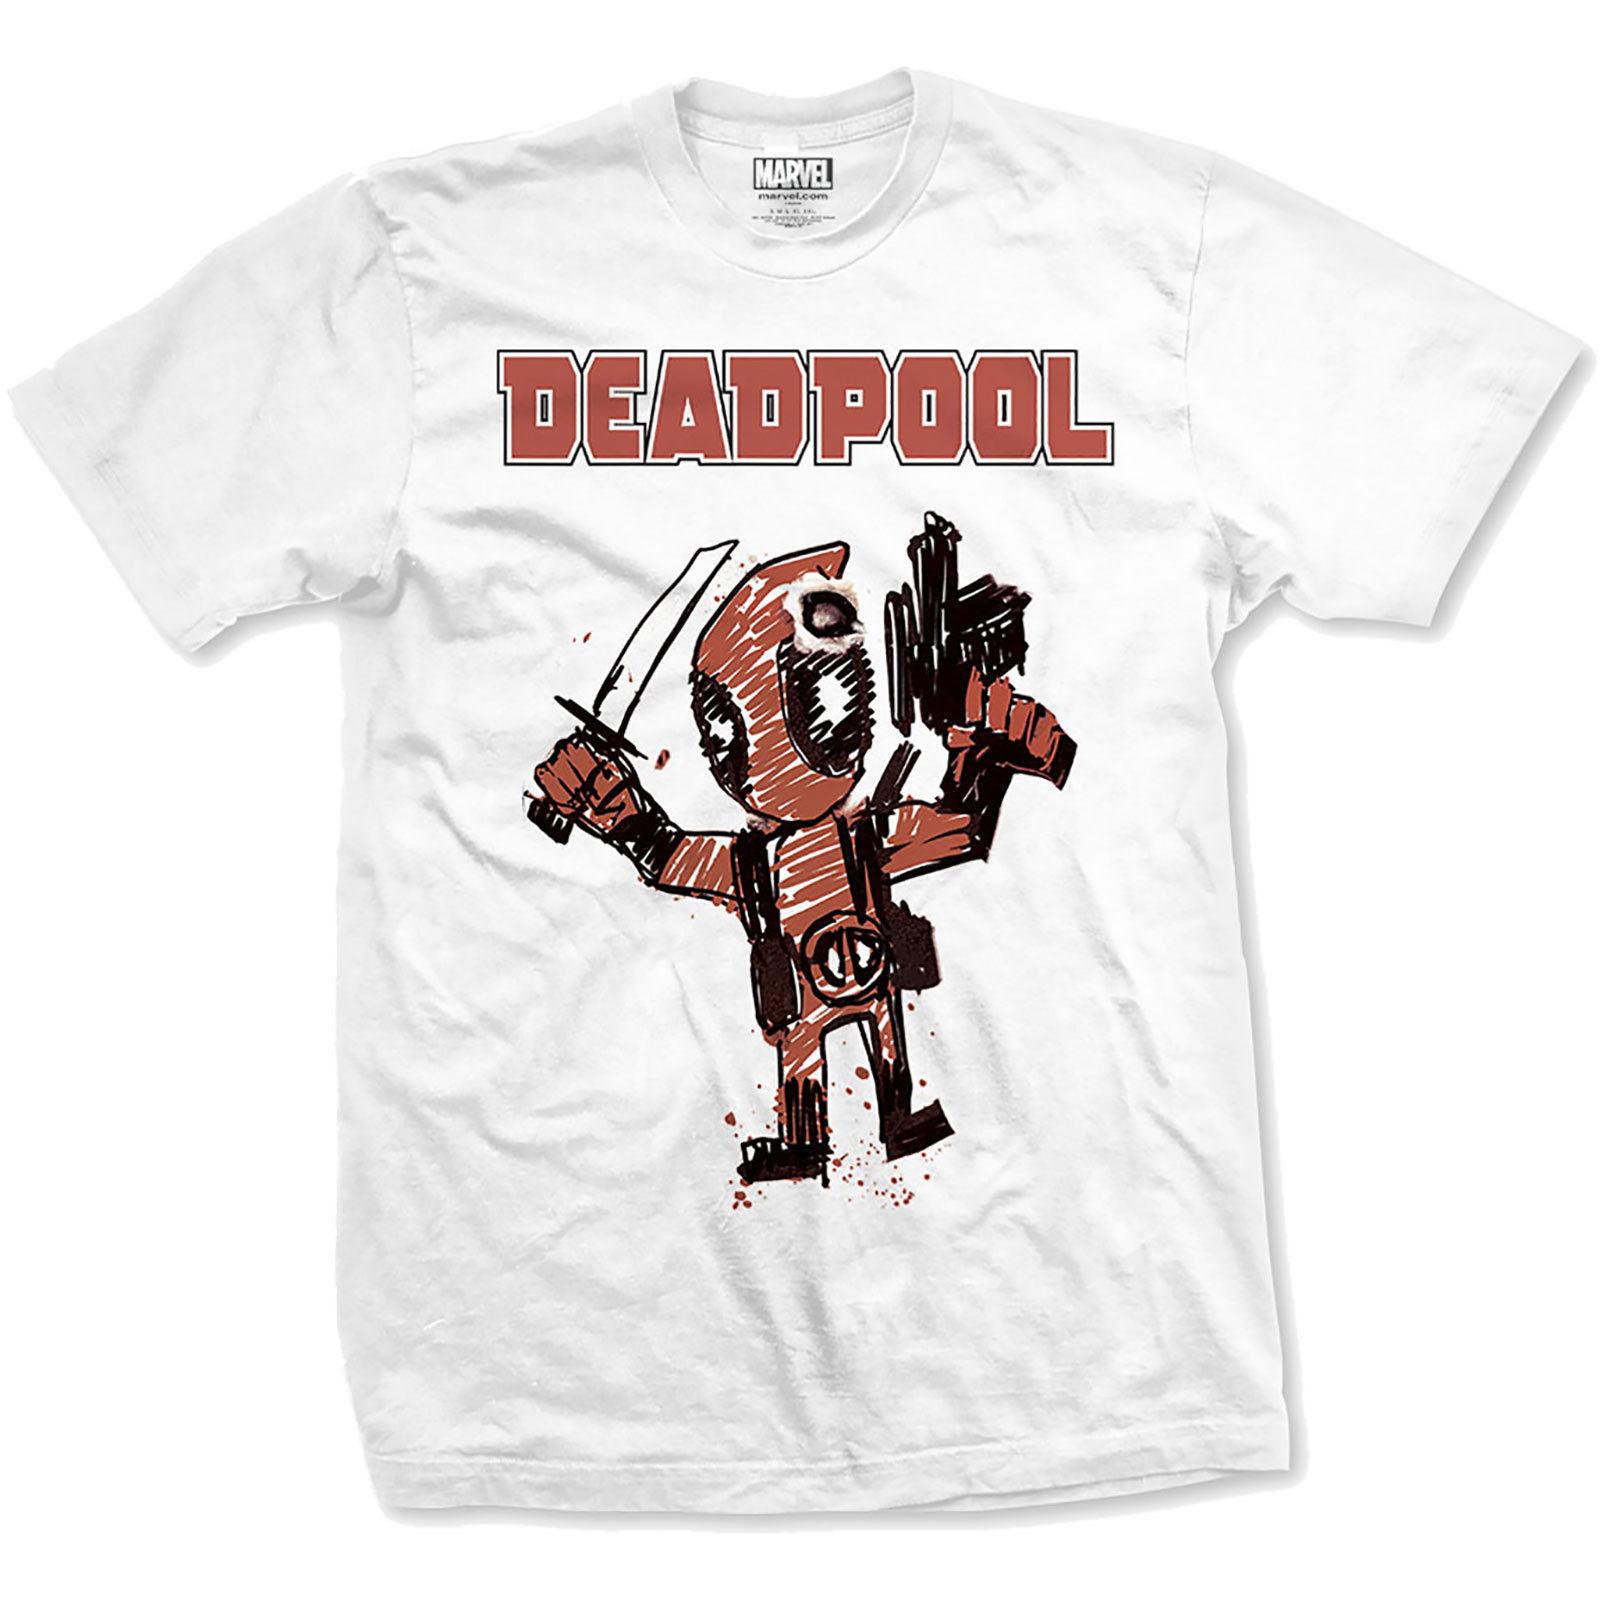 Deadpool Cartoon Bullet (Medium) image